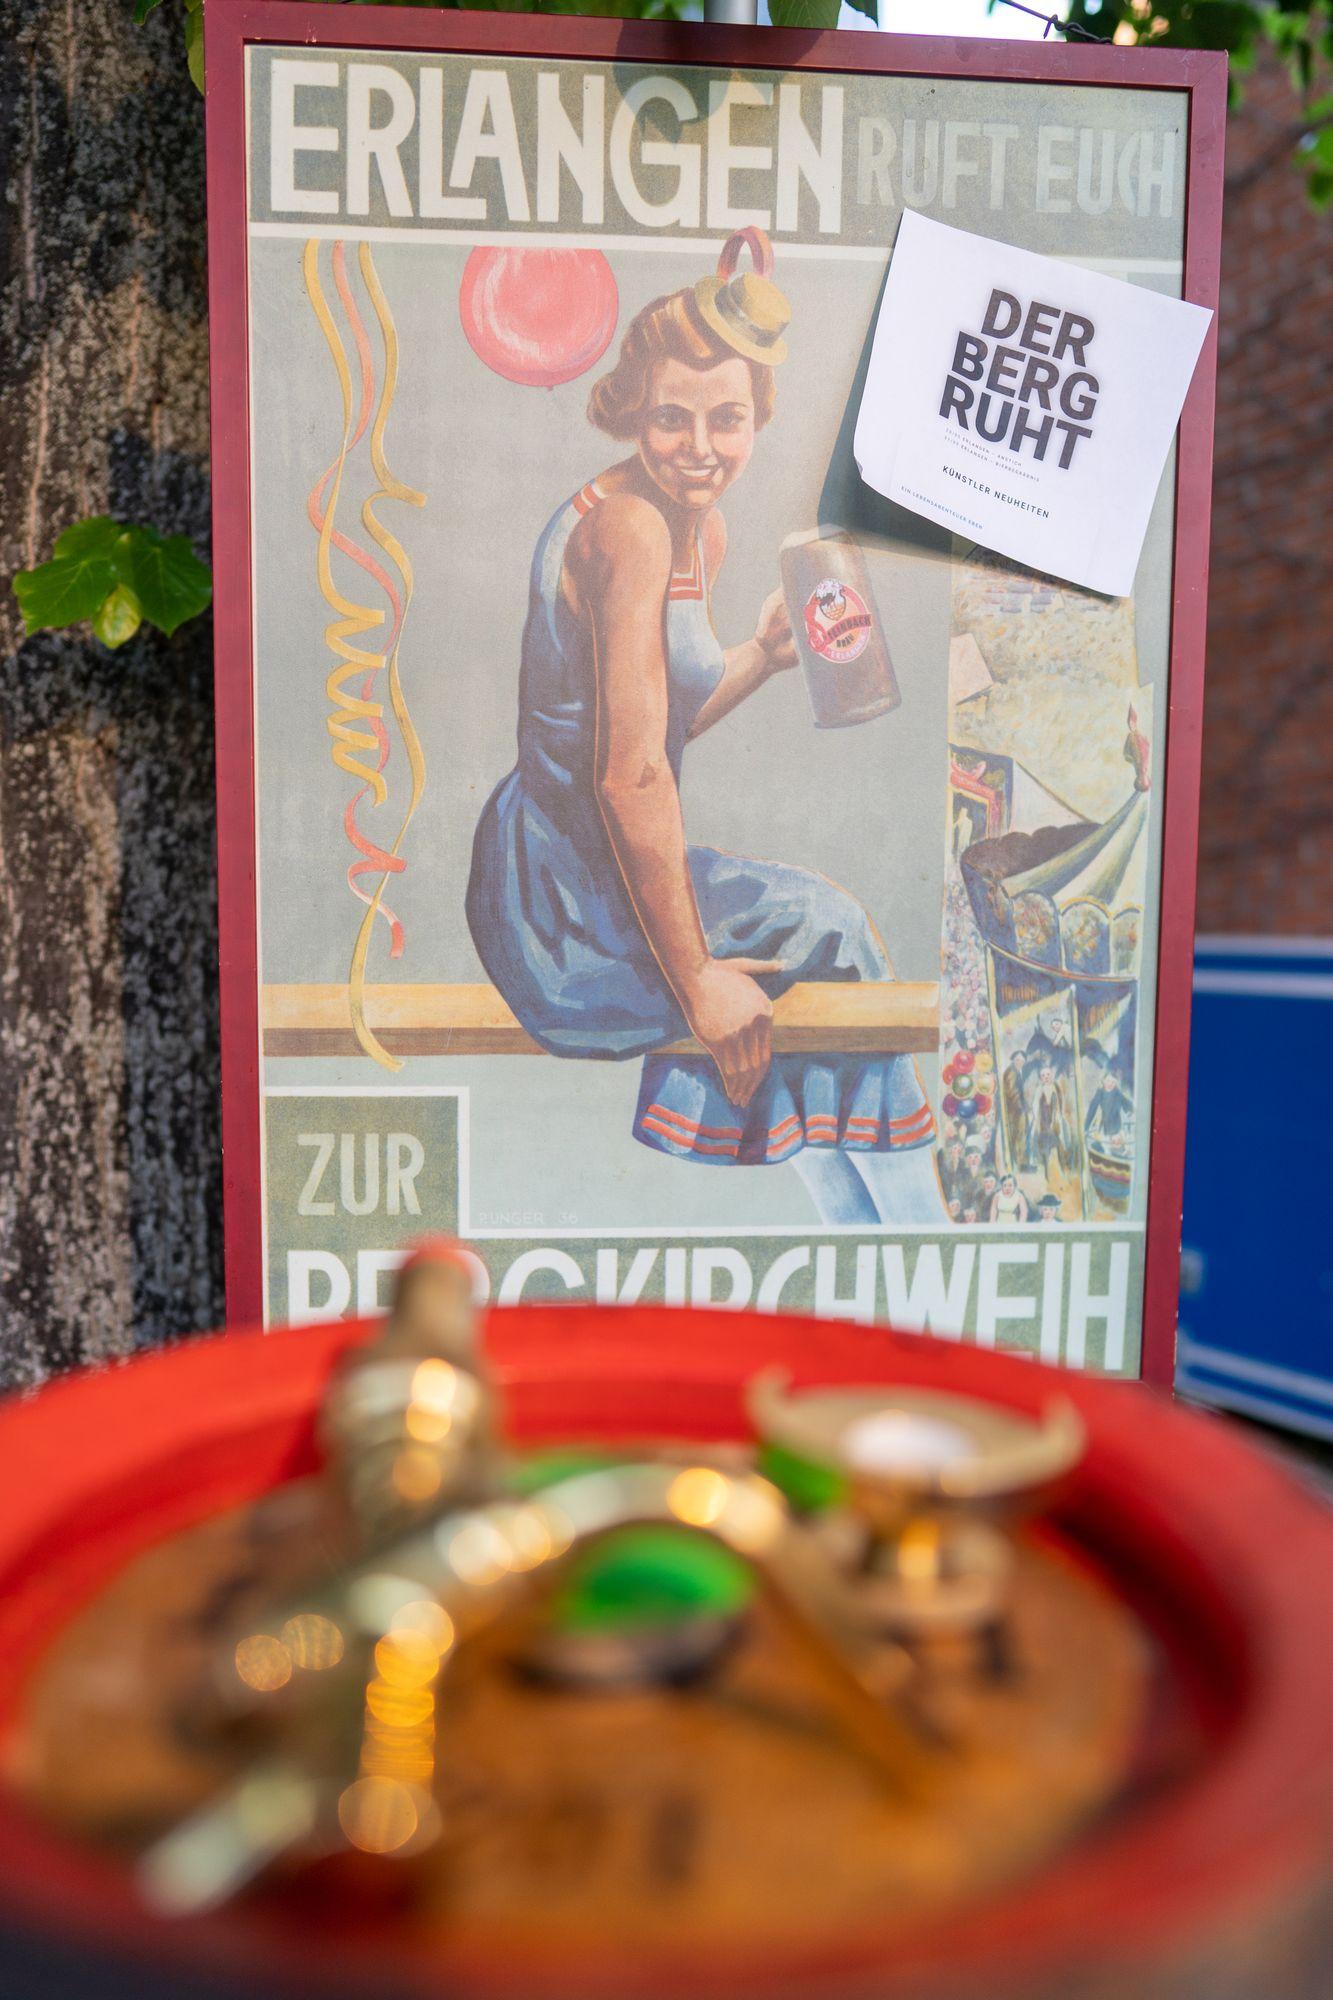 "Steinbach Bergbier 2021 - ""Der Berg ruht"" Erlangen 2021"